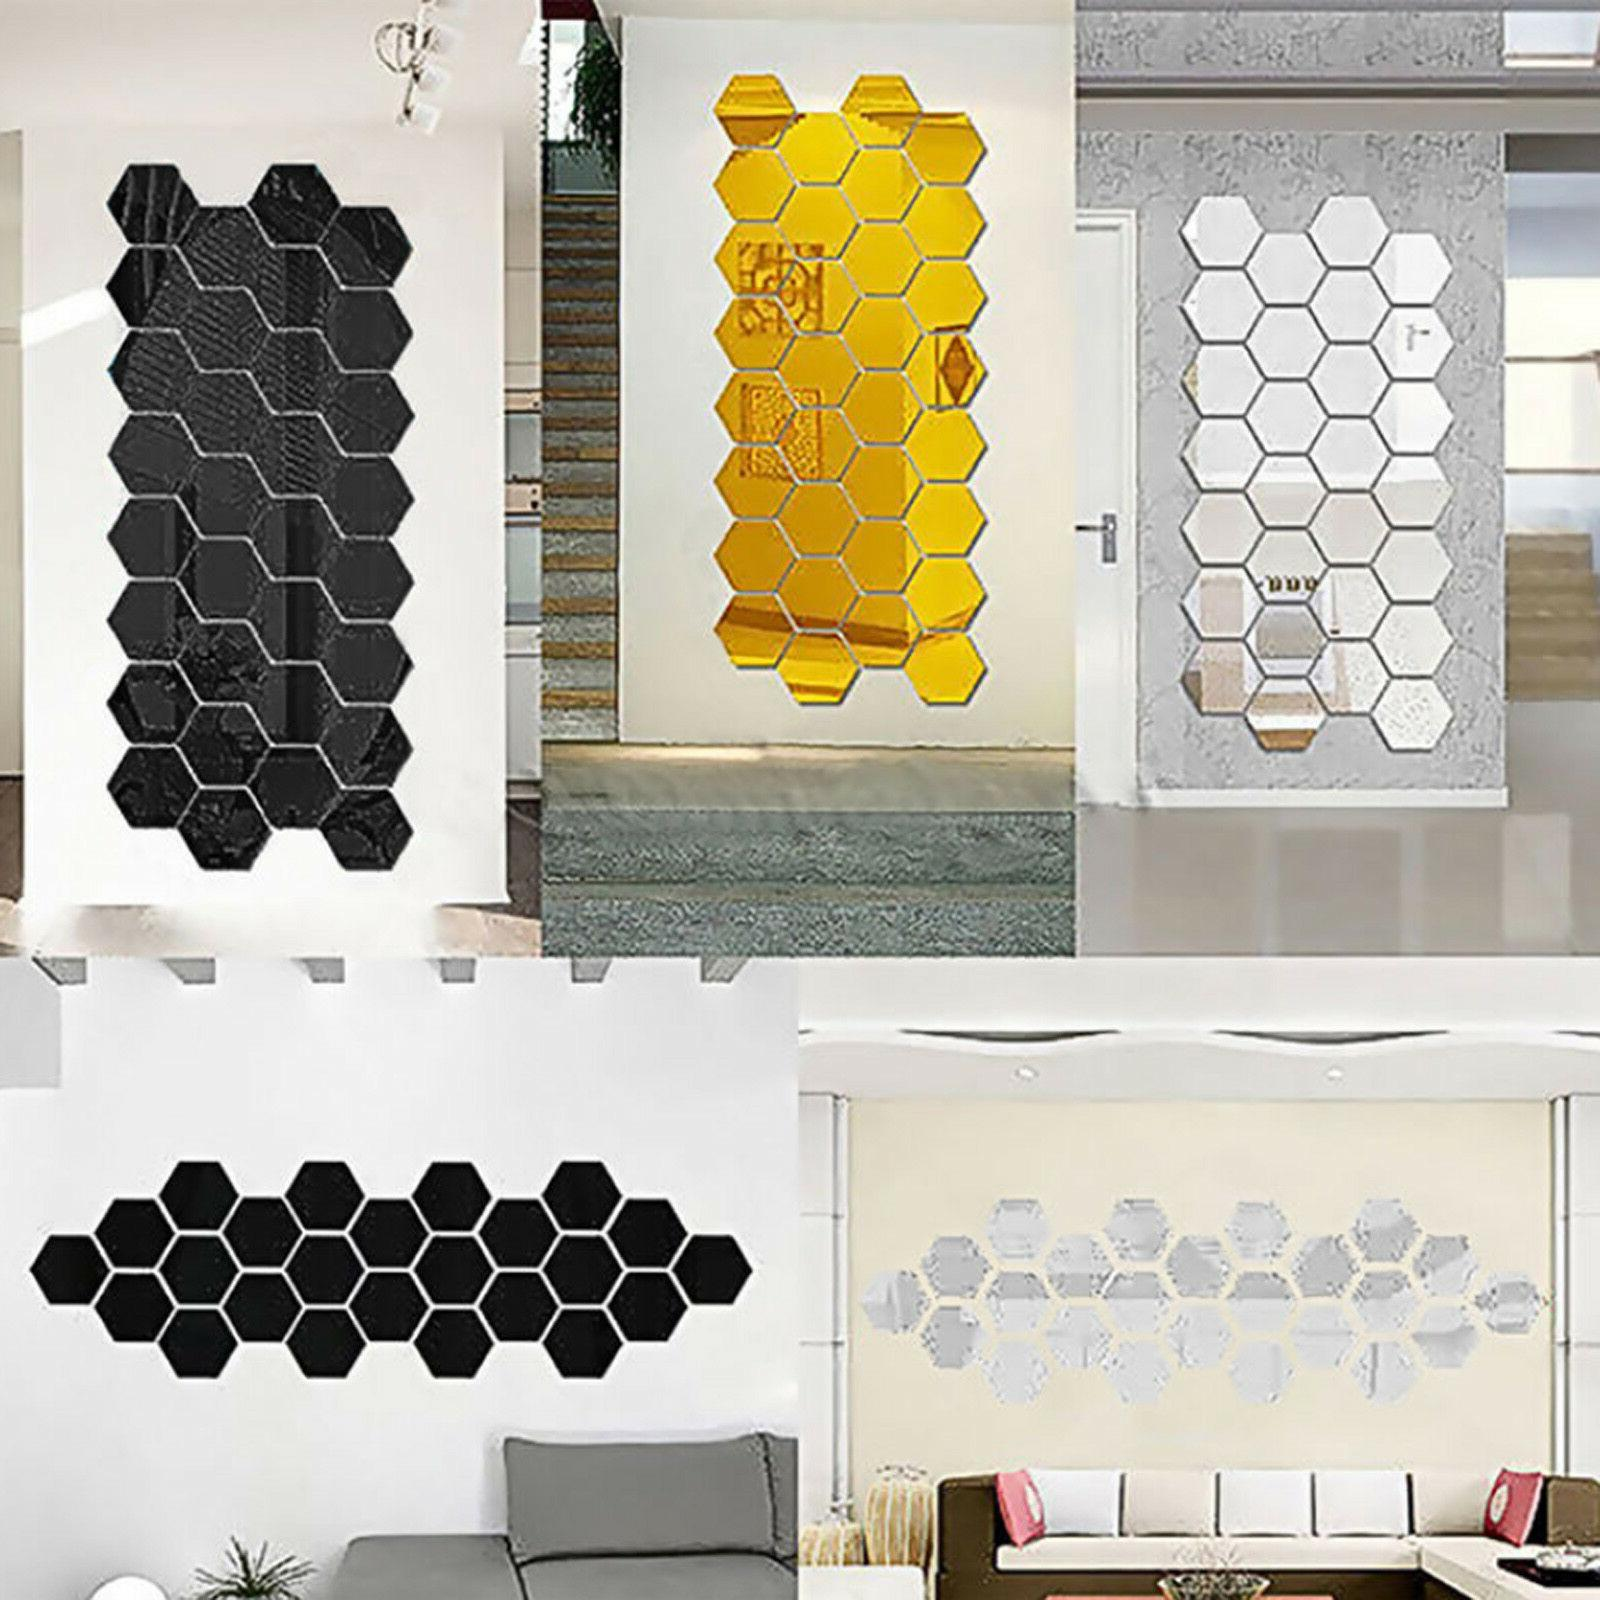 12PCS 3D DIY Mirror Hexagon Vinyl Removable Wall Sticker Dec